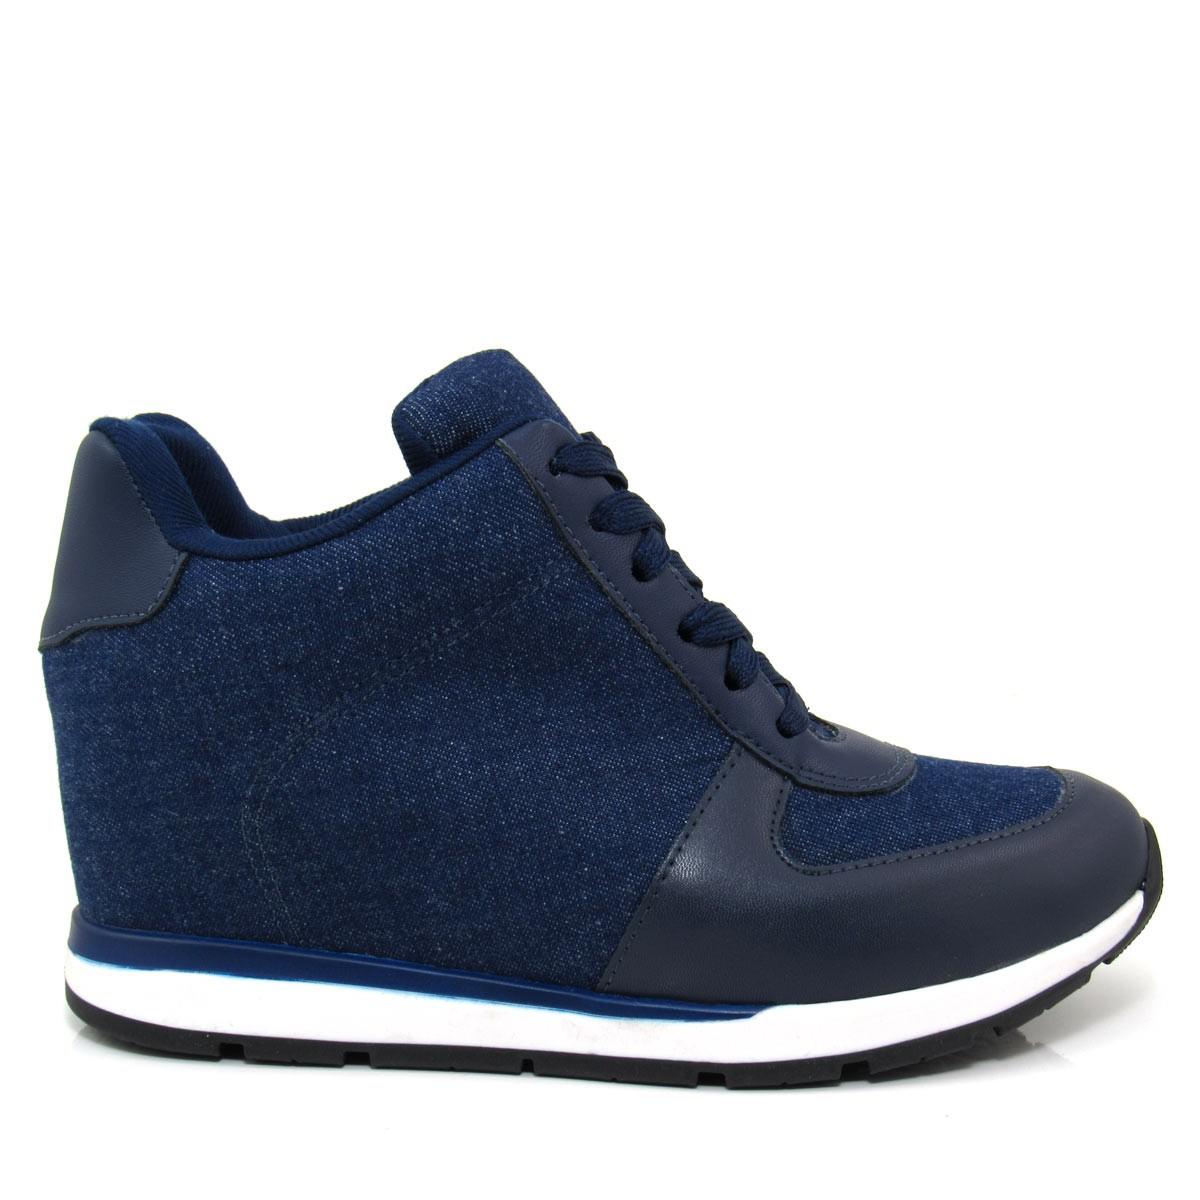 25b7916674d Tênis Sneaker Feminino Vizzano 1226102 Jeans Coleção 2018